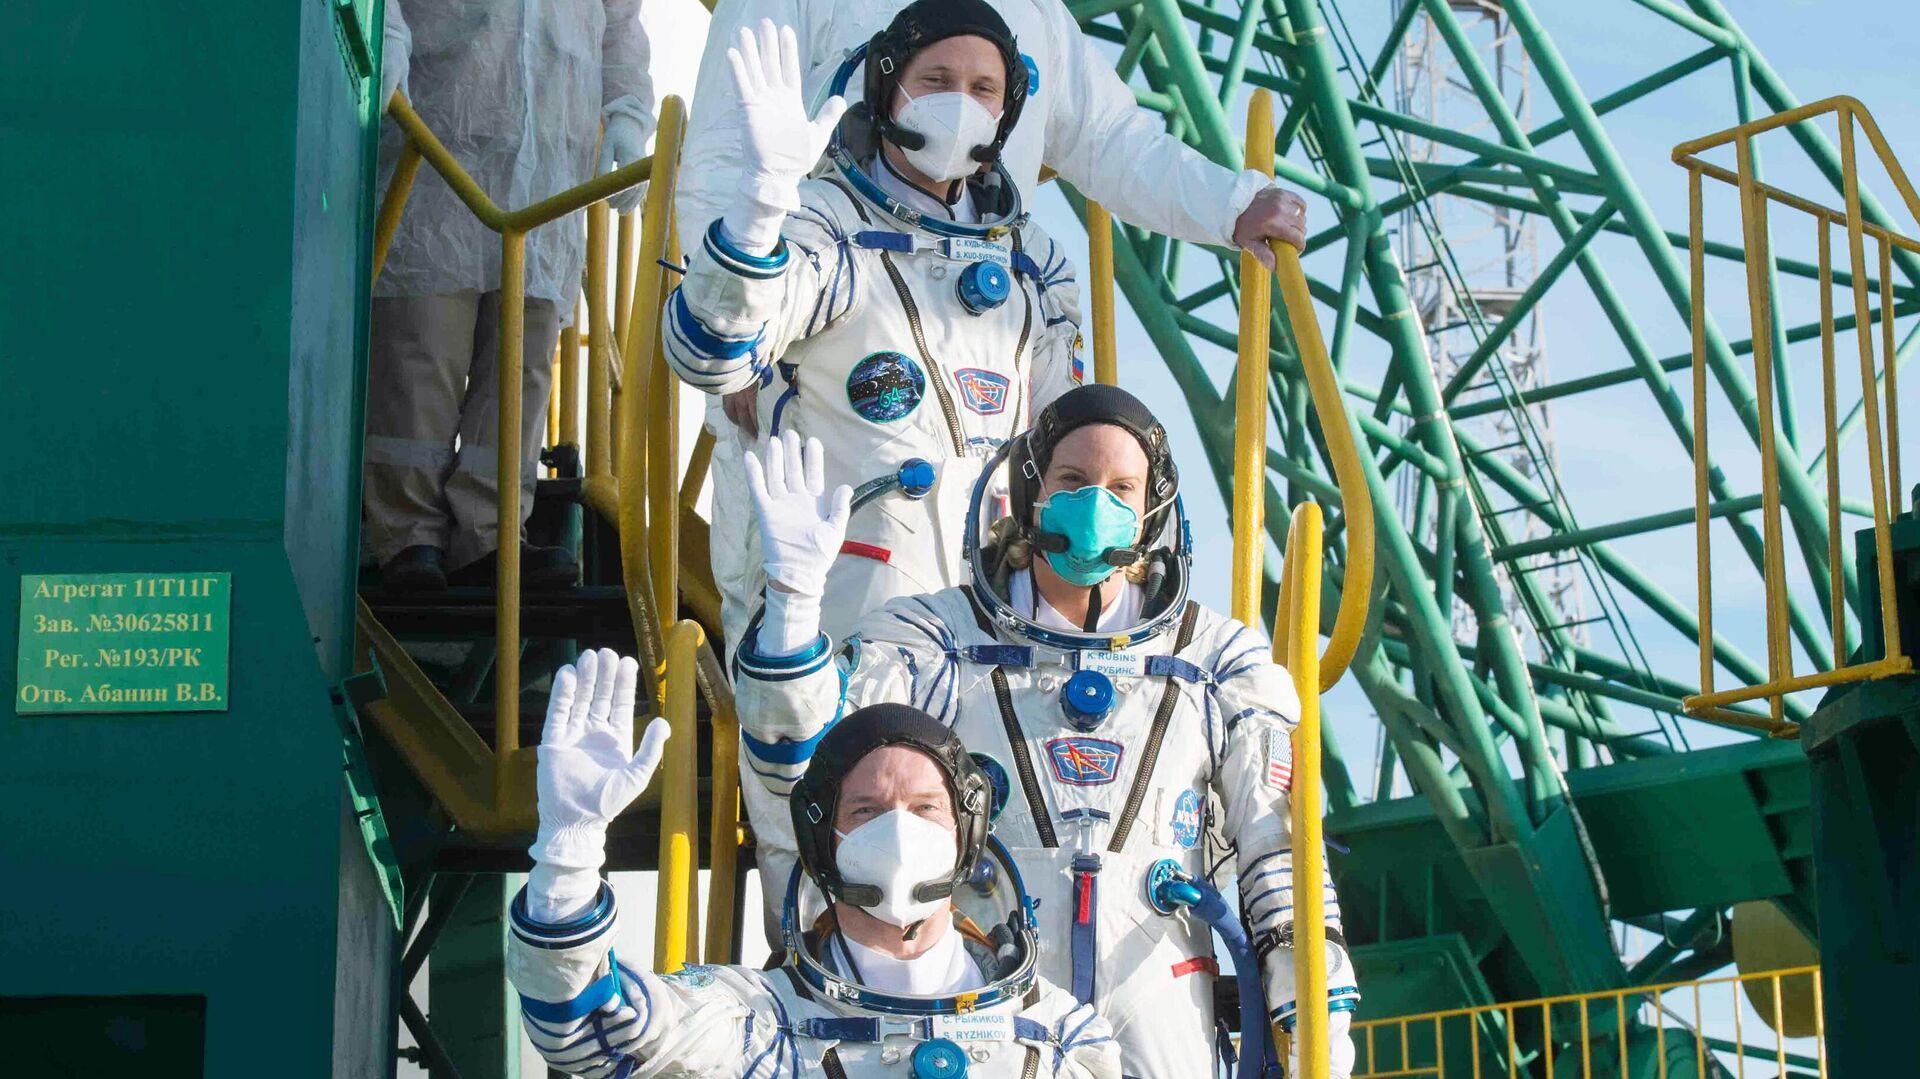 La expedición 64, compuesta por los cosmonautas rusos Serguéi Ryzhikov, Serguéi Kud-Sverchkov y la astronauta Kate Rubins - Sputnik Mundo, 1920, 16.04.2021